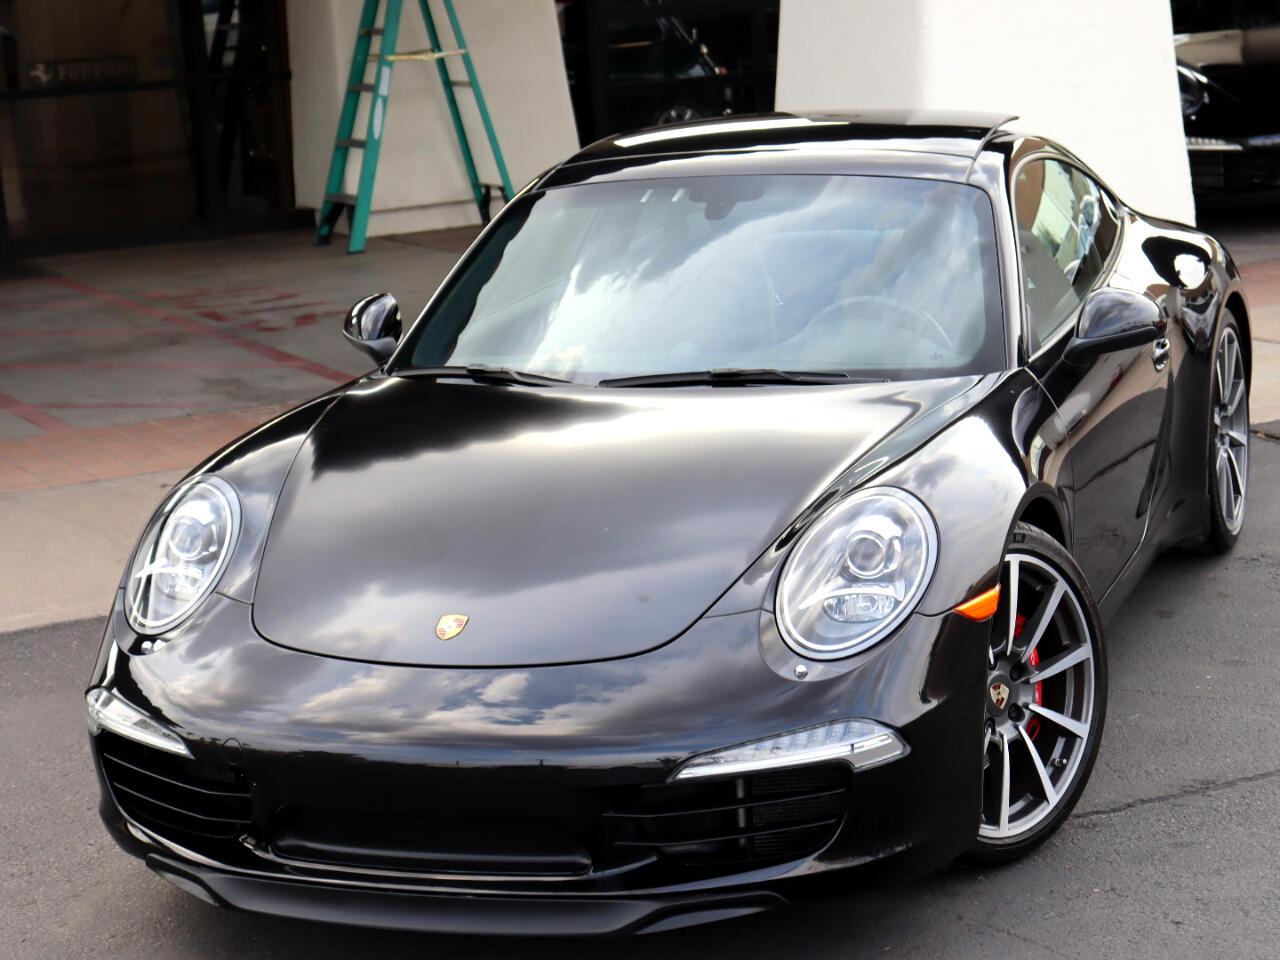 Porsche 911 Carrera S Coupe 2012